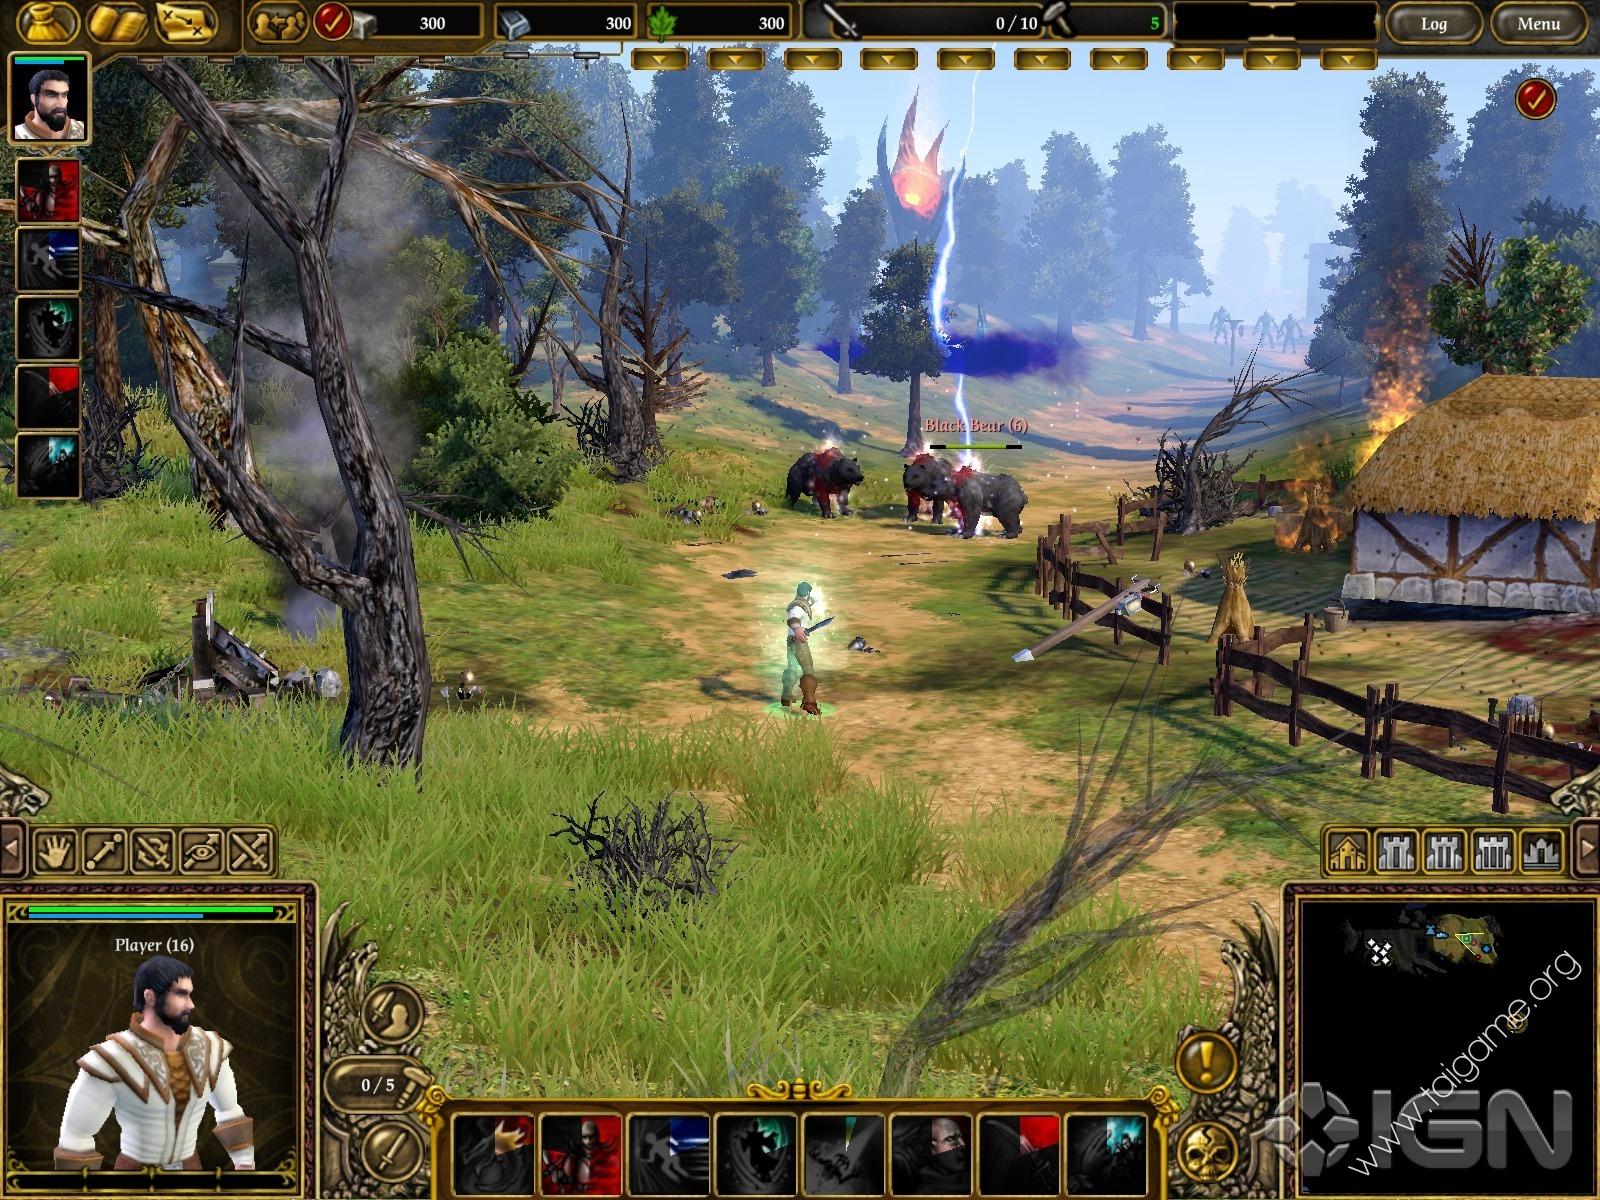 destiny 2 how to choose trostland on map